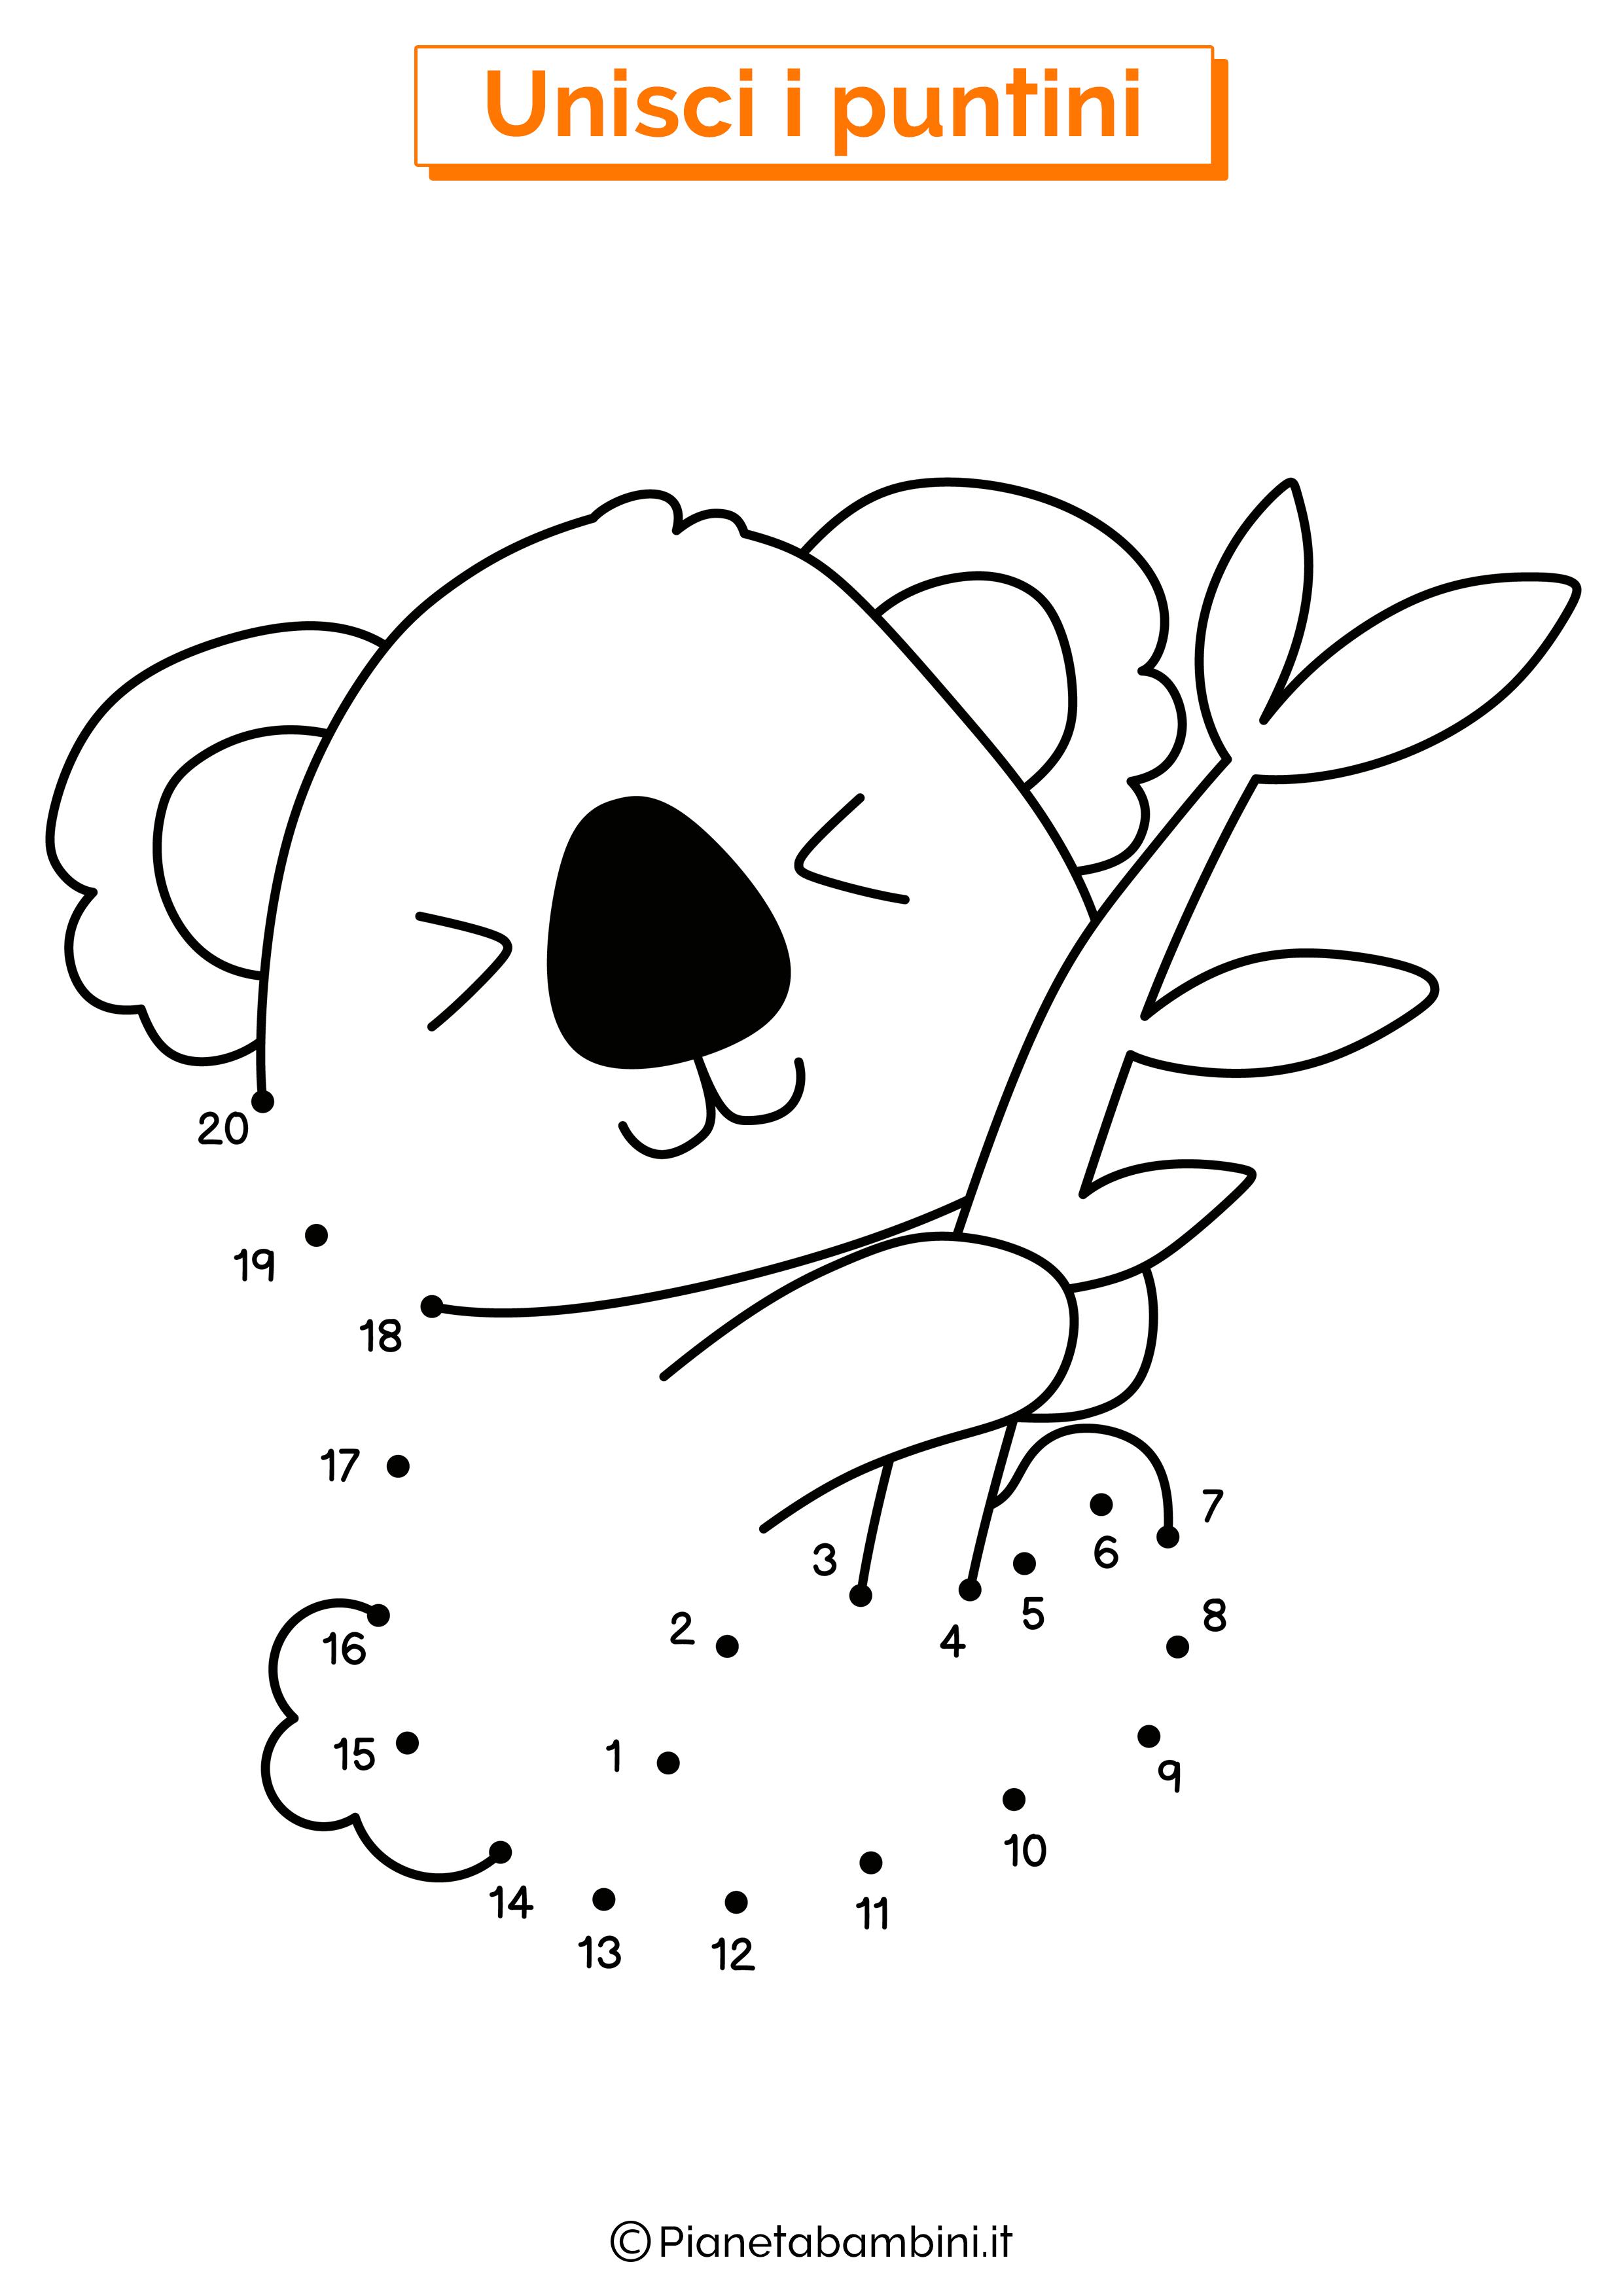 Disegno unisci i puntini koala